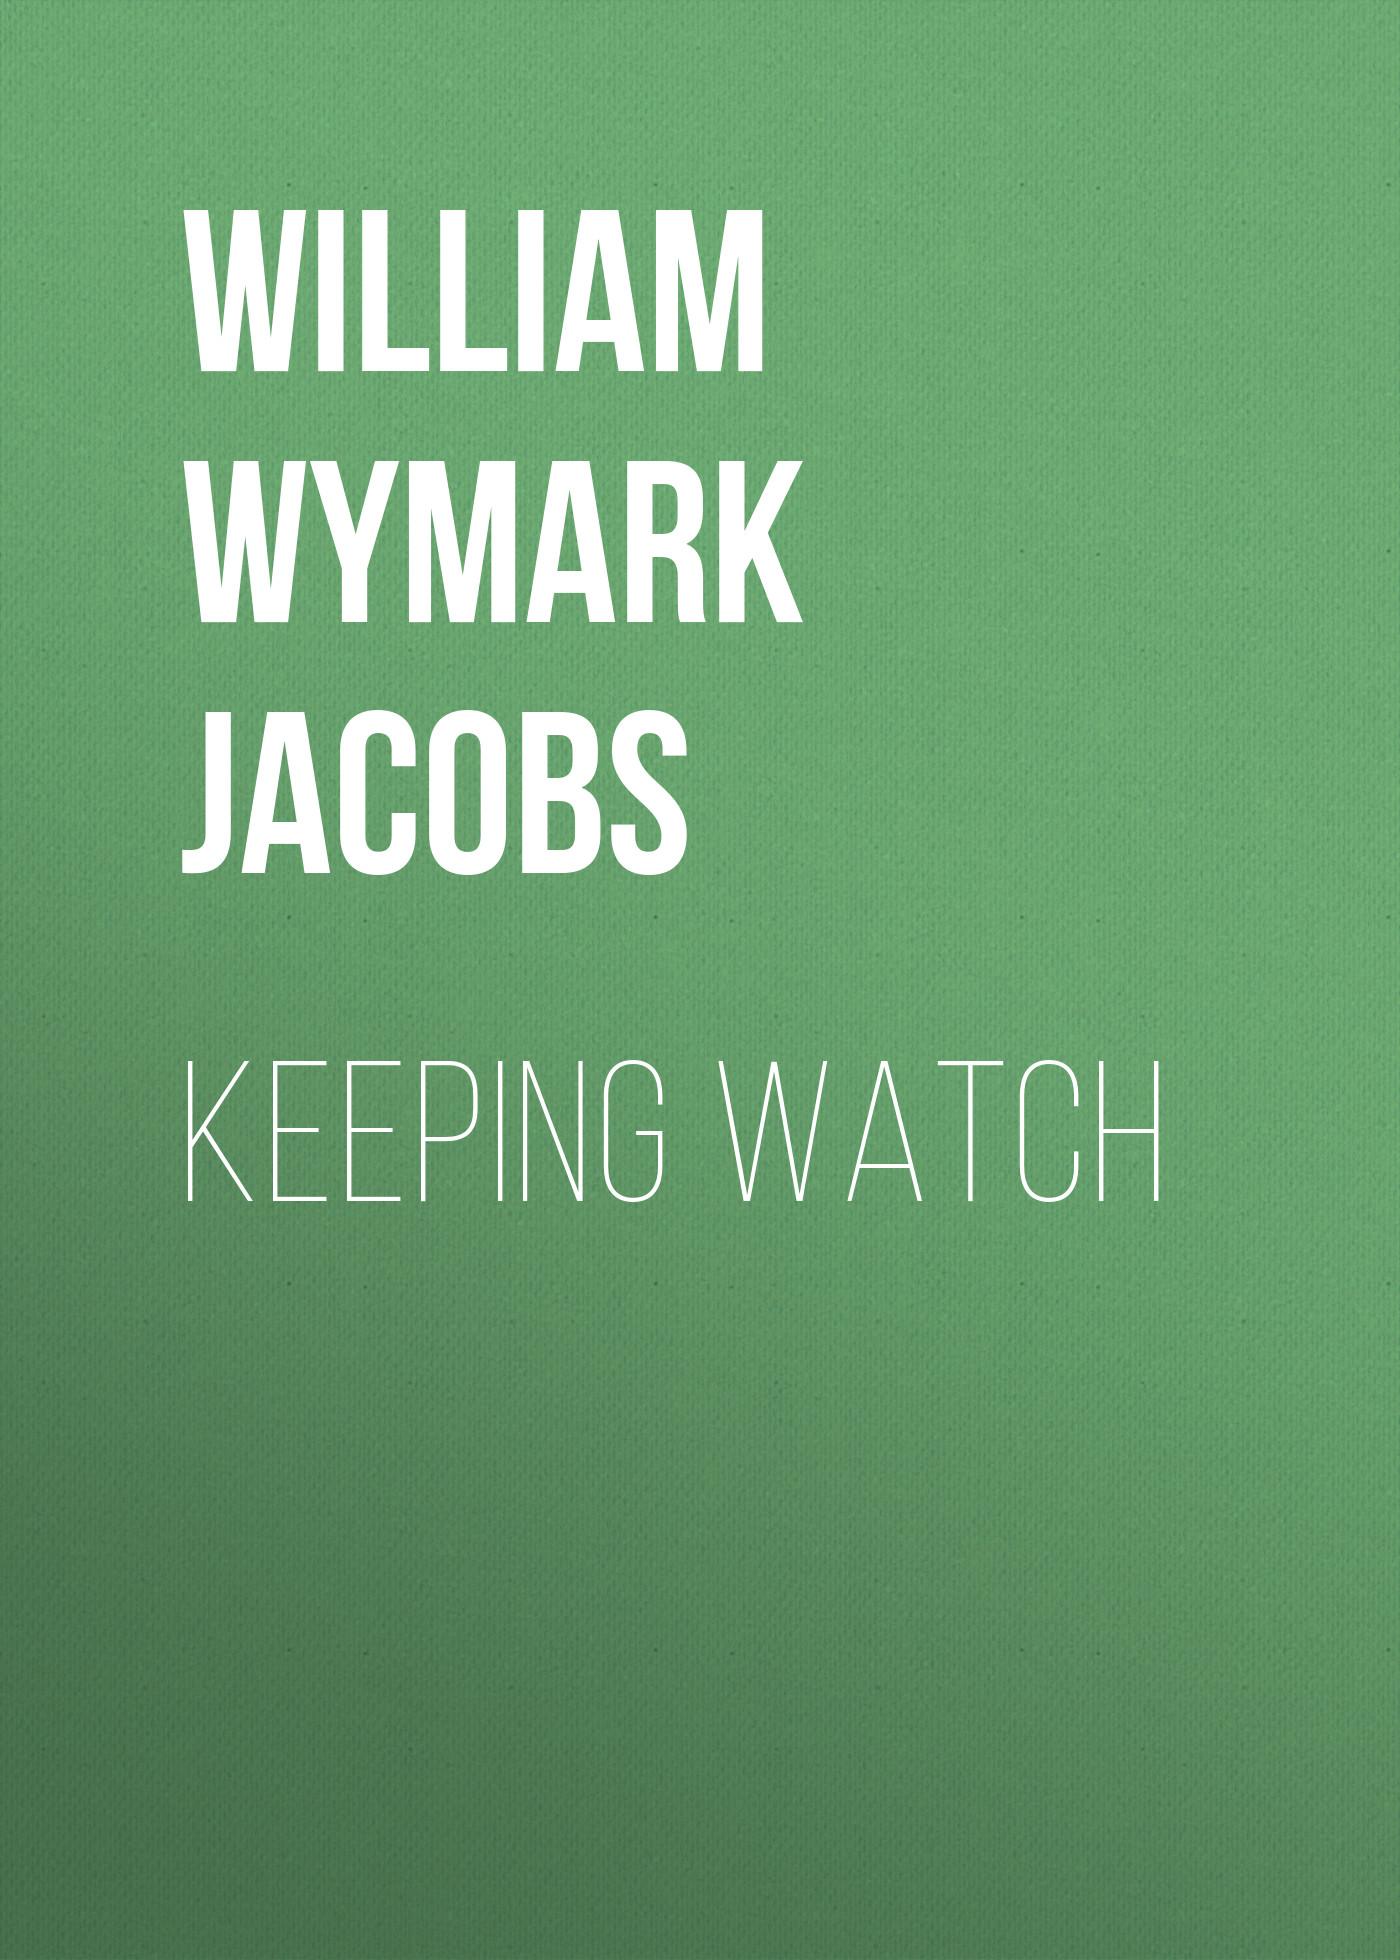 William Wymark Jacobs Keeping Watch william wymark jacobs keeping watch